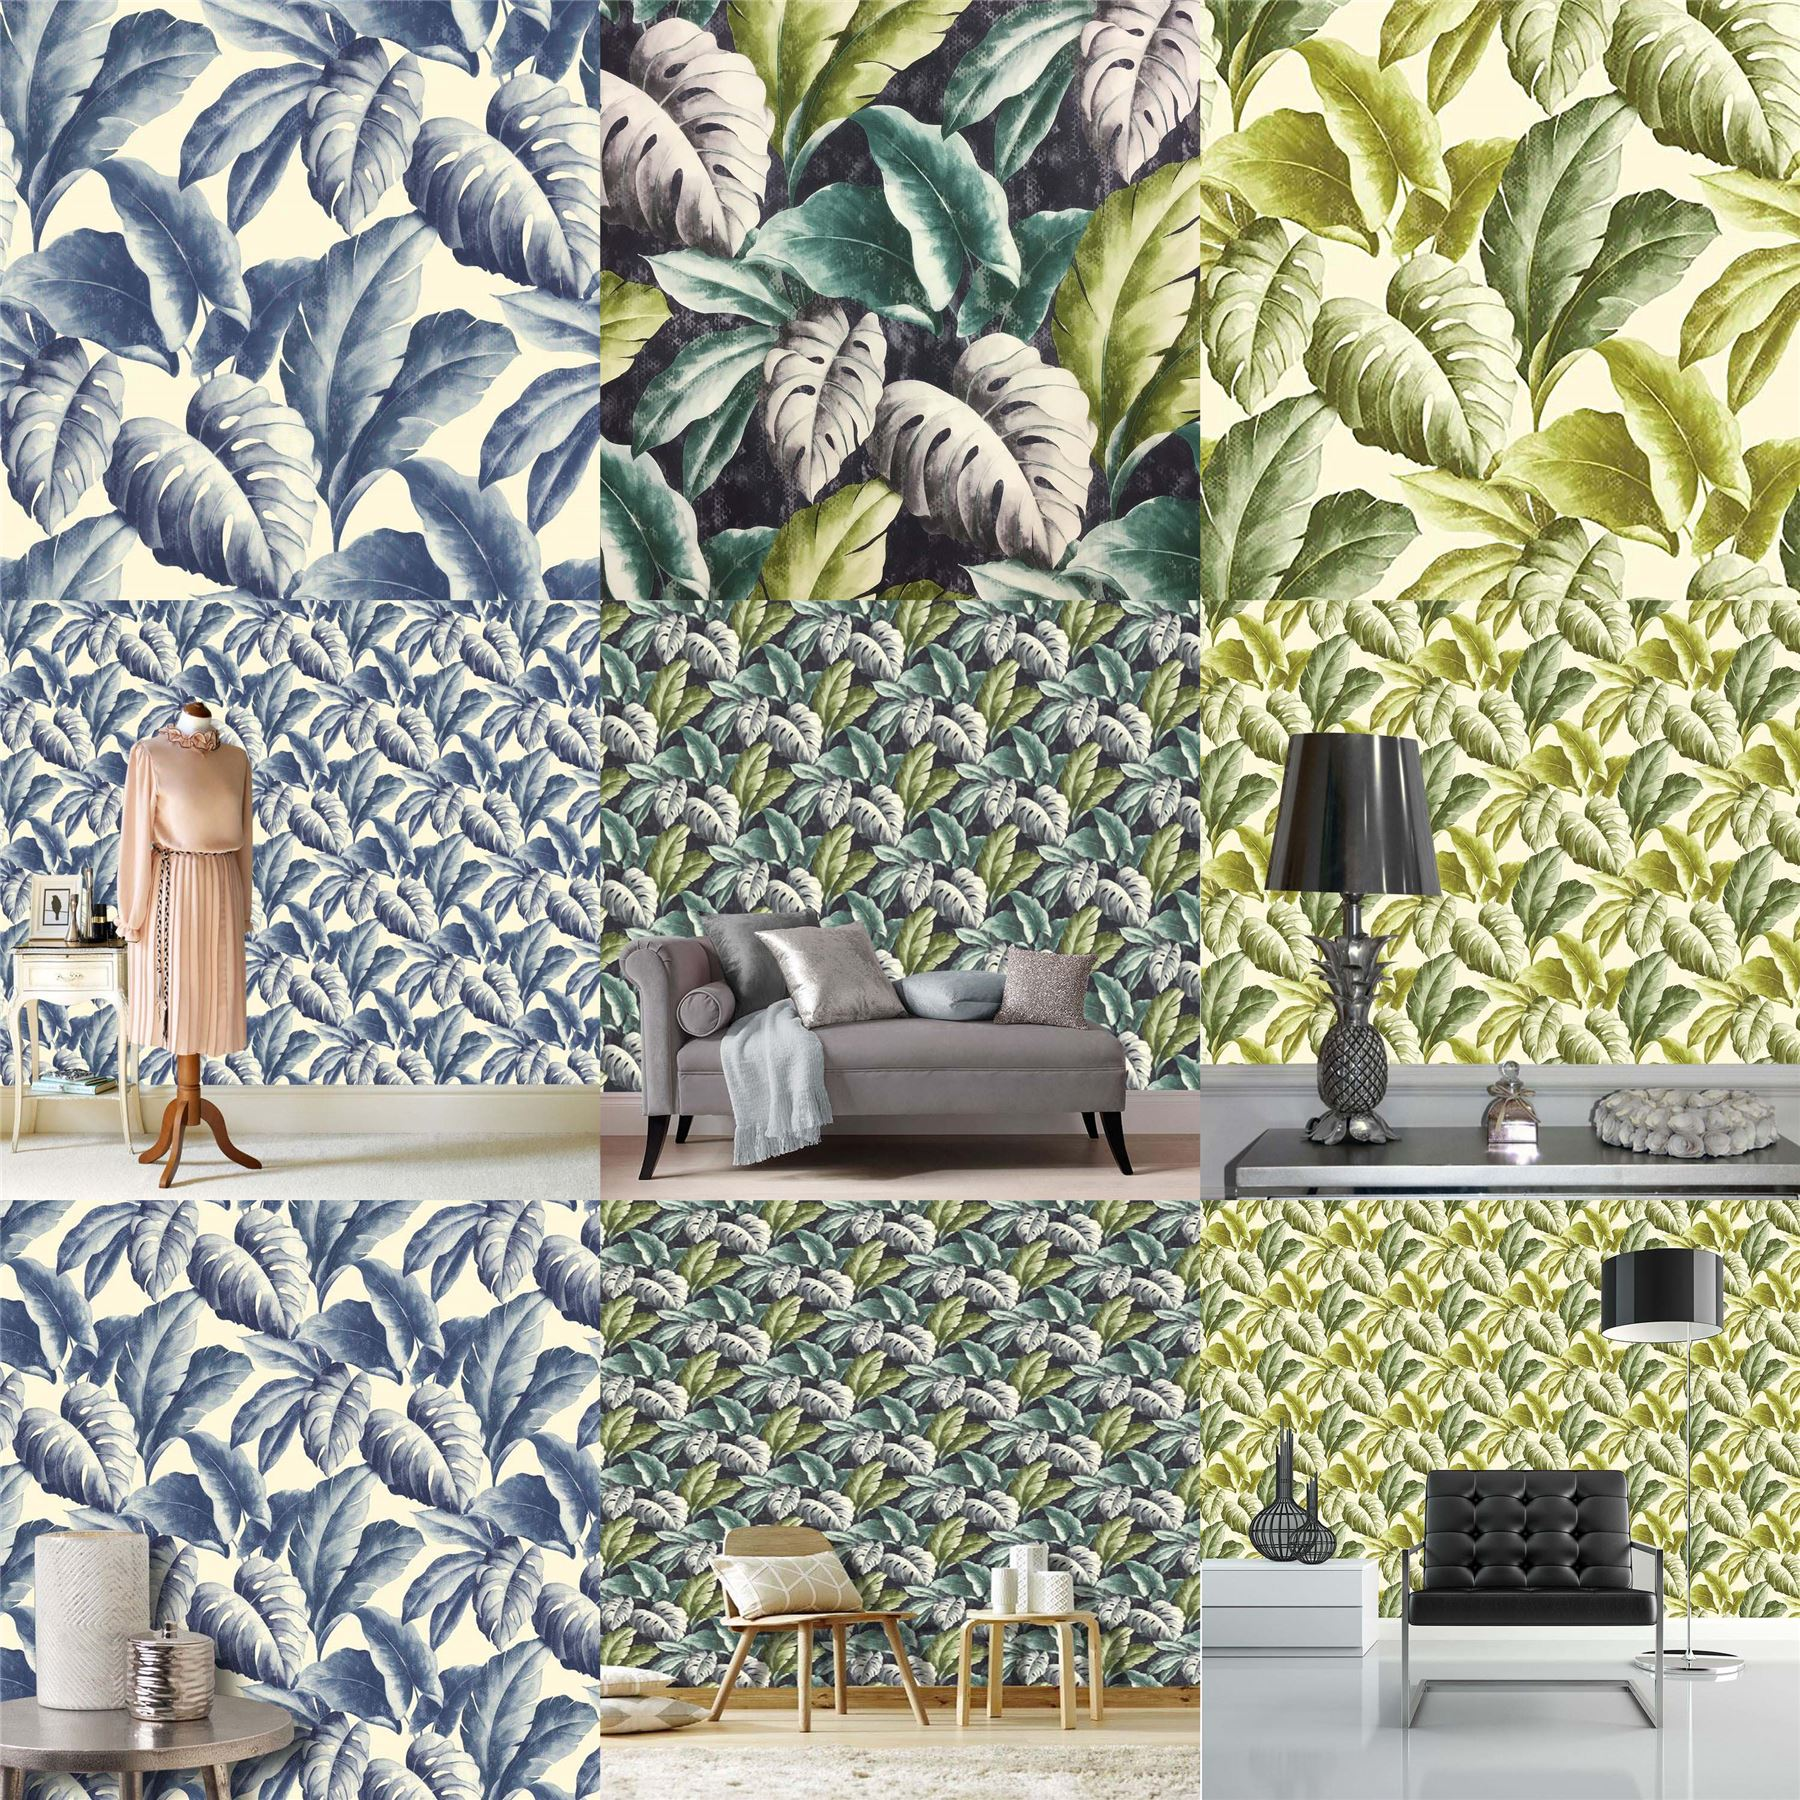 Vinyl Wallpaper Botanical Tropical Leaves Pattern Tree Textured Motif Green Blue